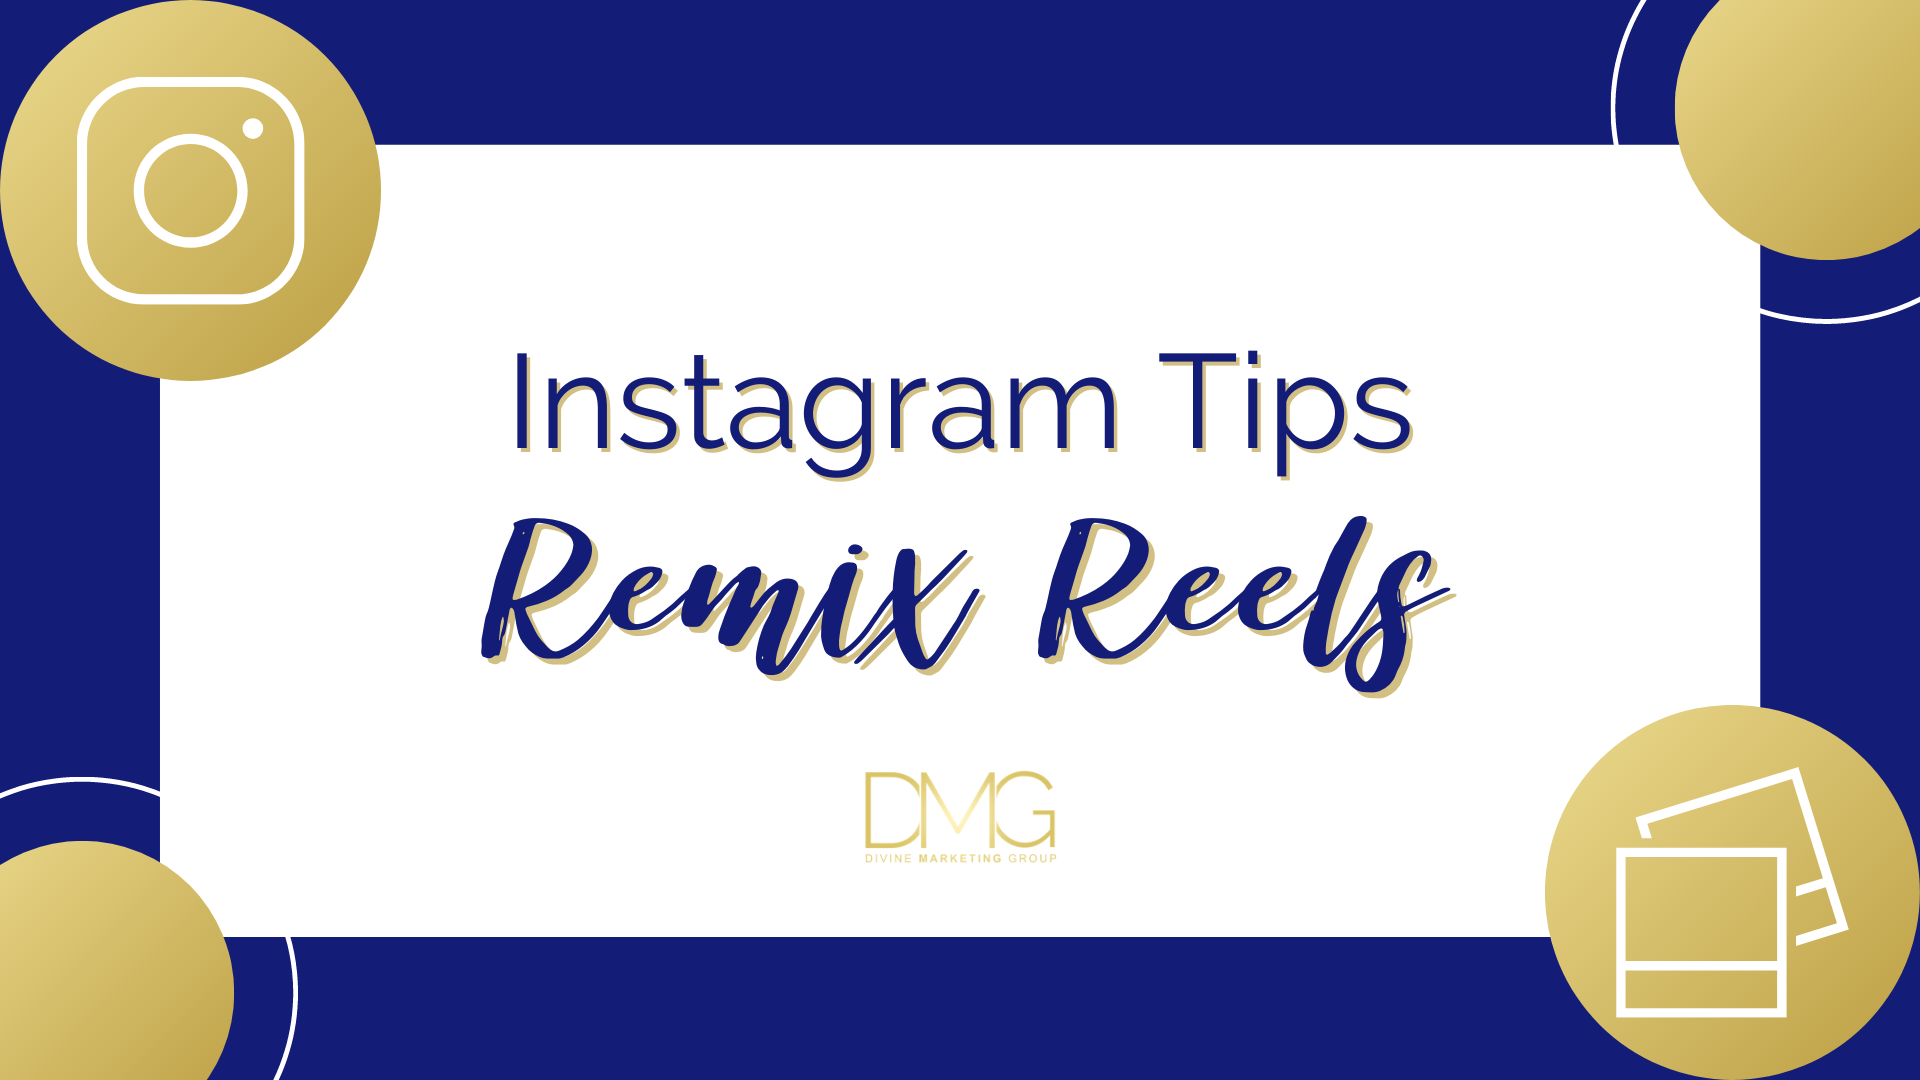 Remix Reels